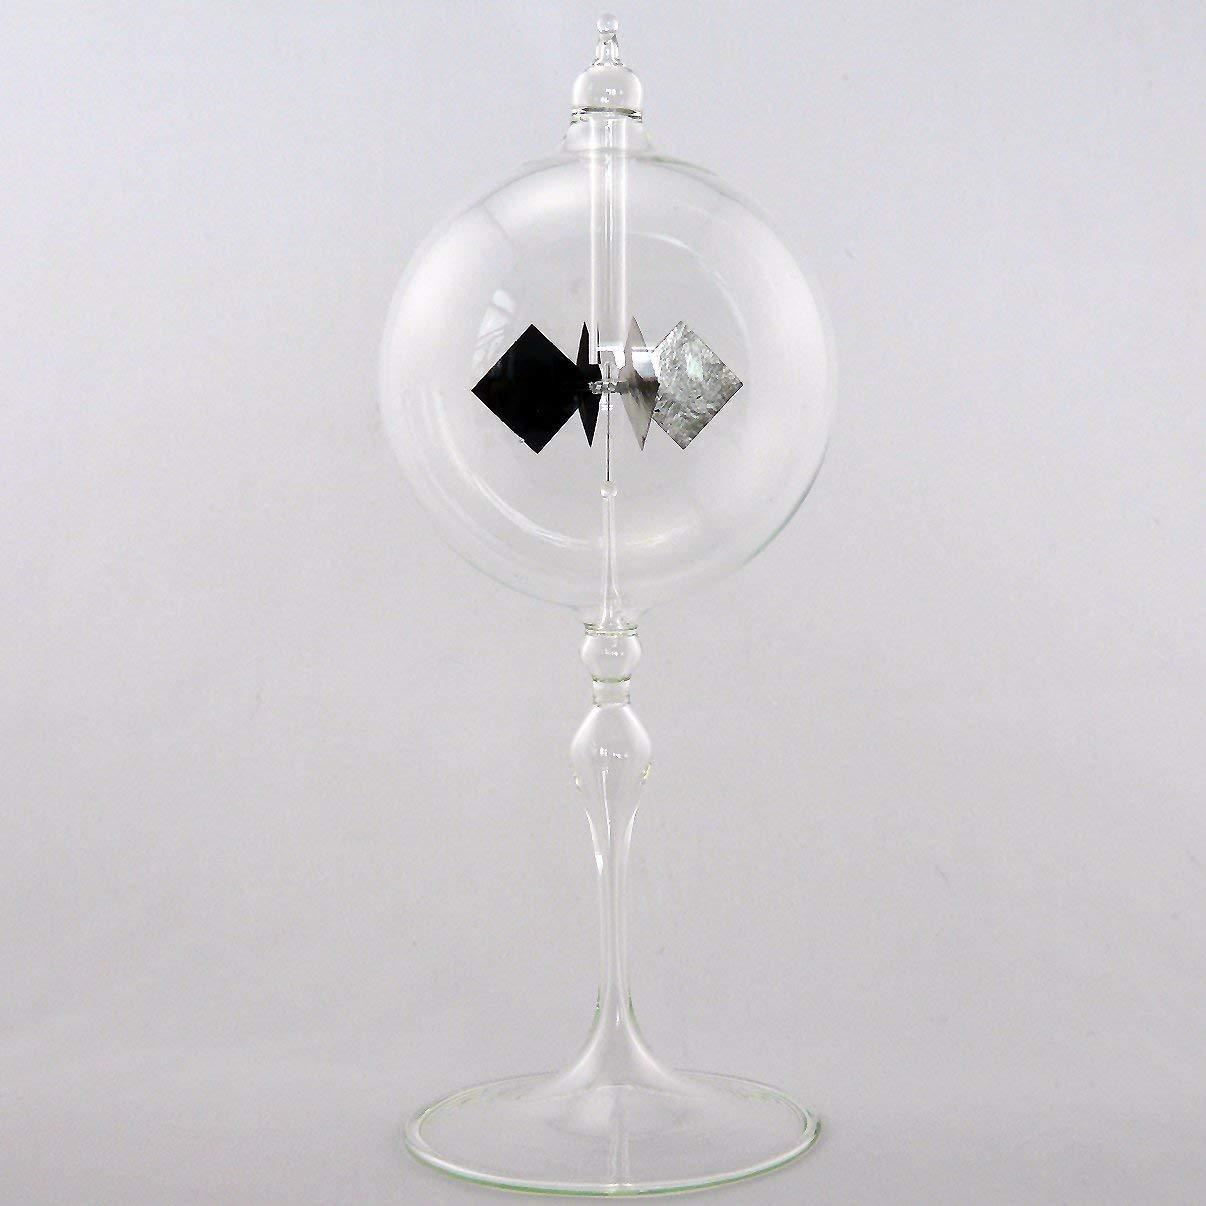 Radi/ómetro Solar Radi/ómetro Parado Alto Pies 100mm Vidrio Transparente